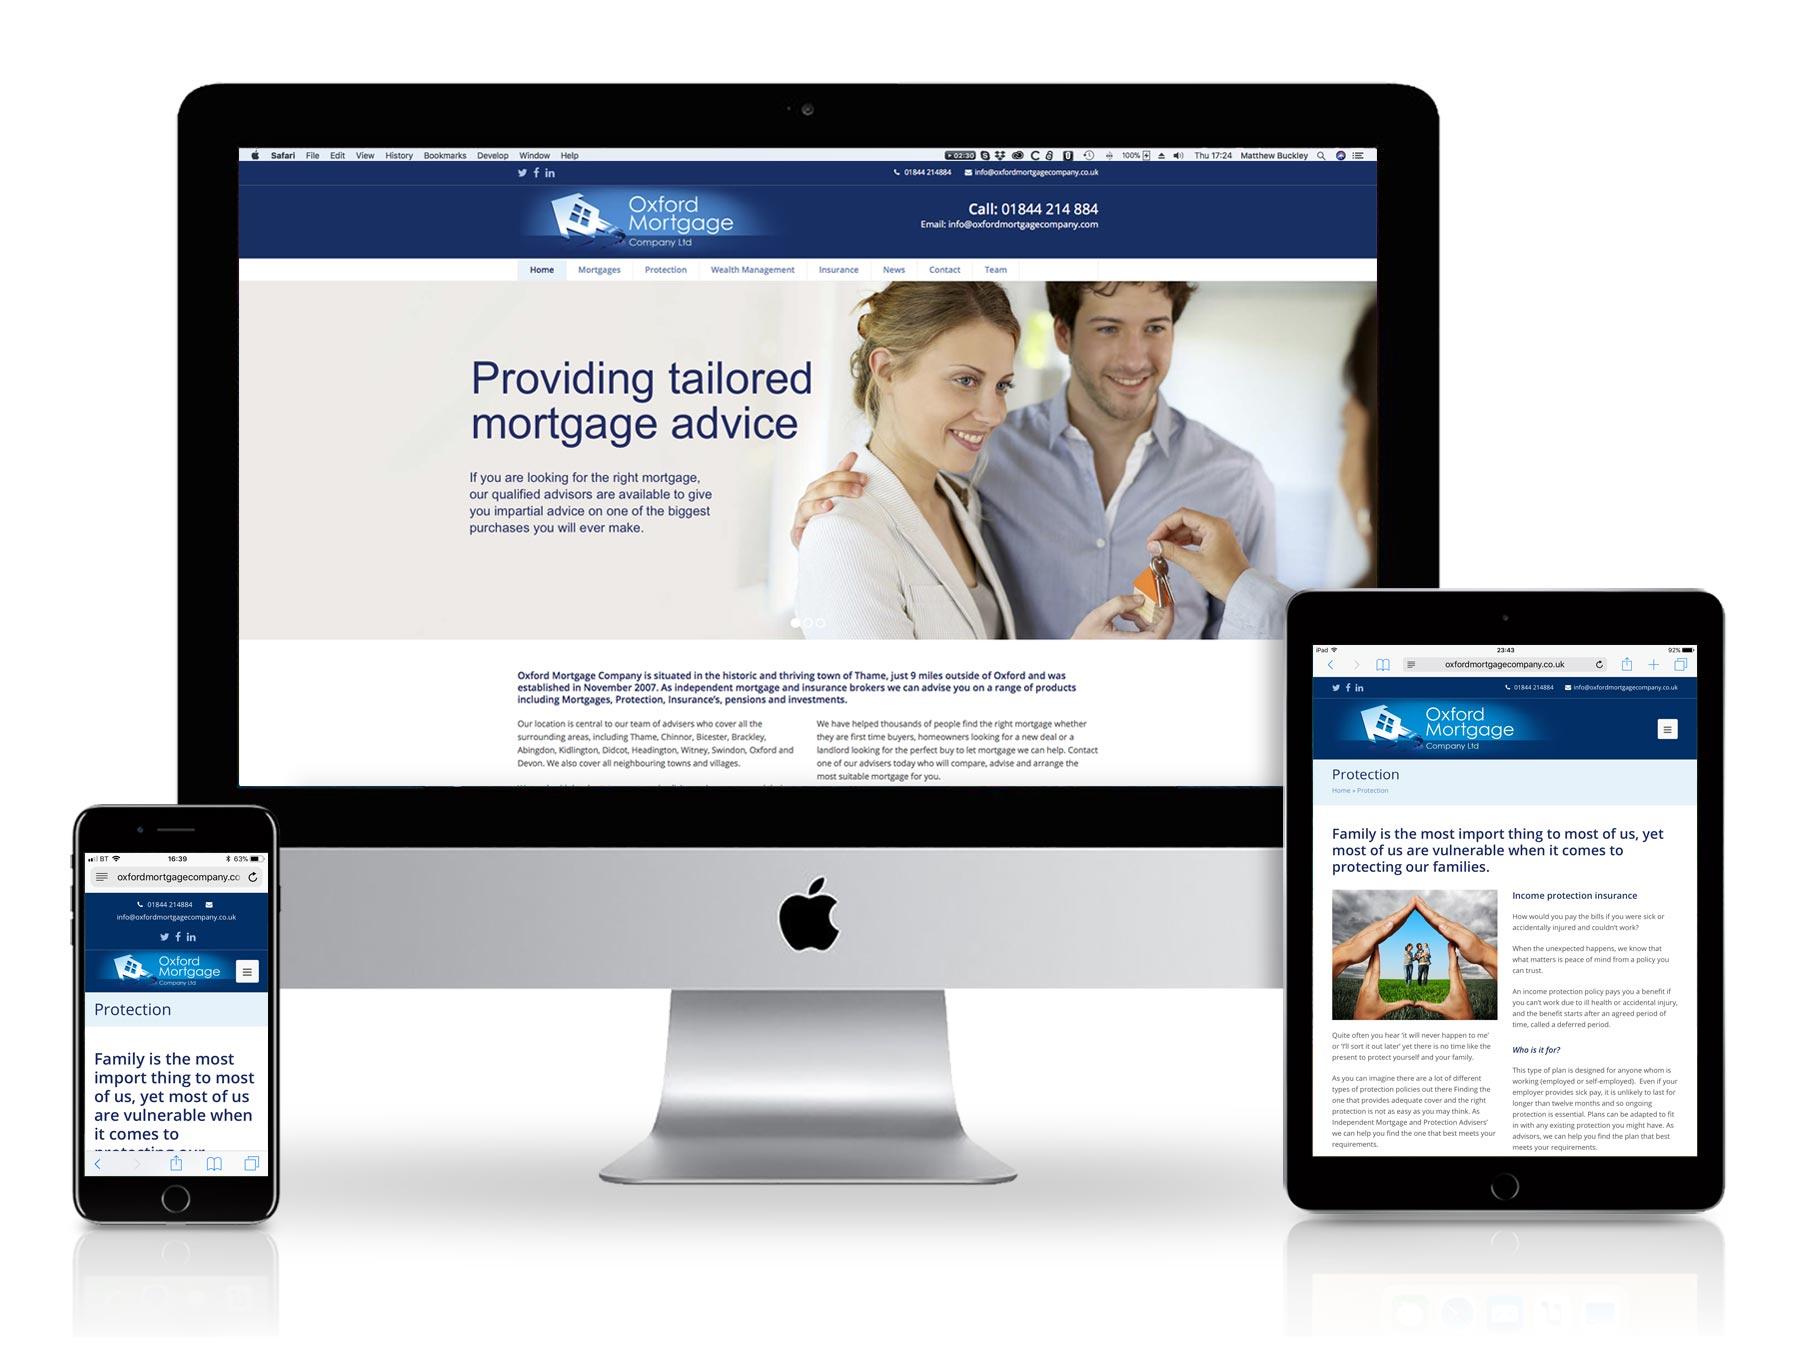 Oxford Mortgage Company website